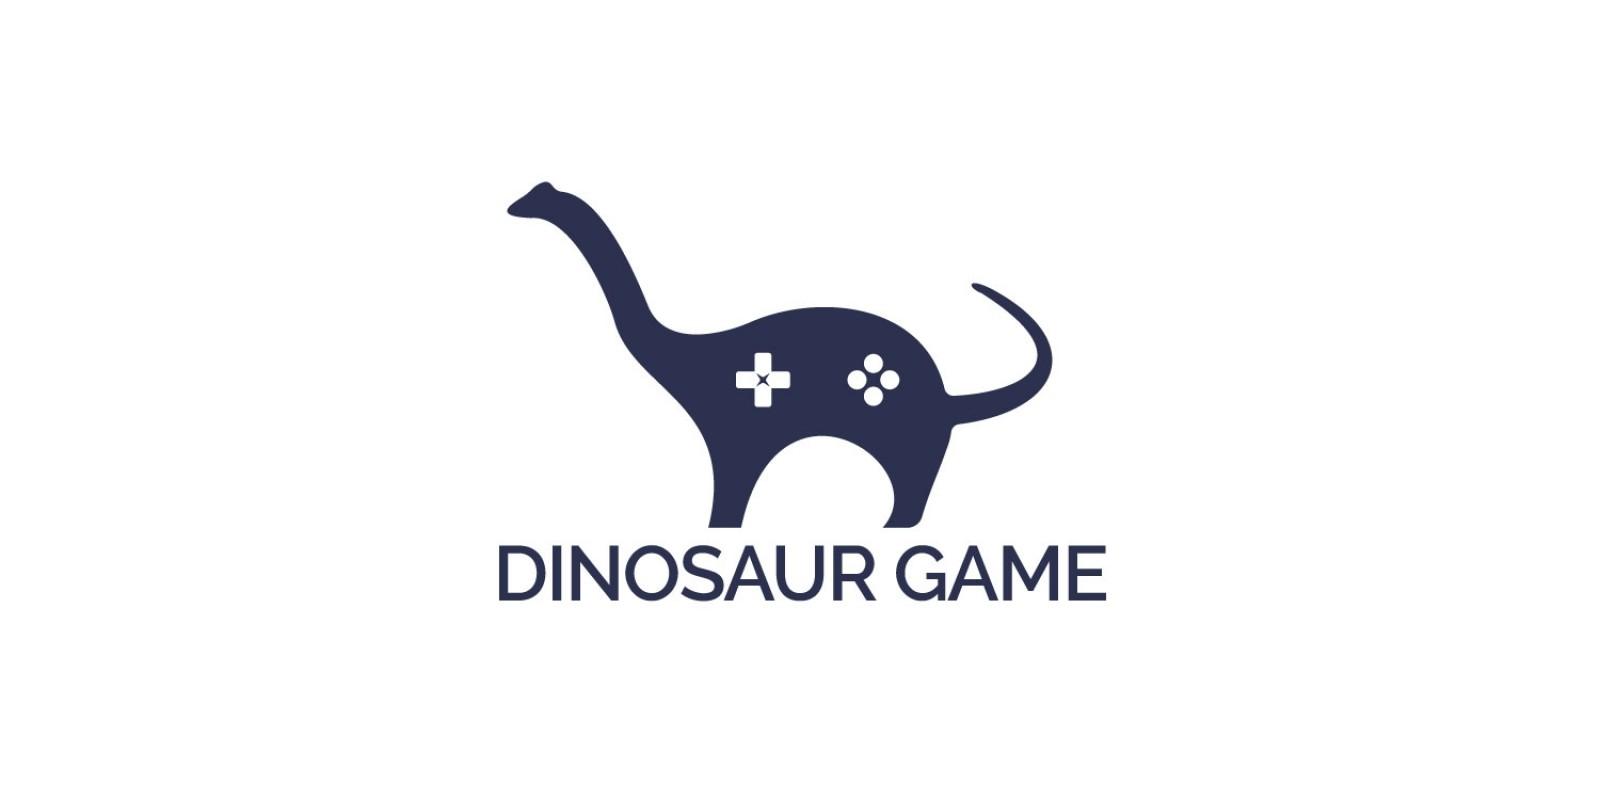 Dinosaur Game Logo Design